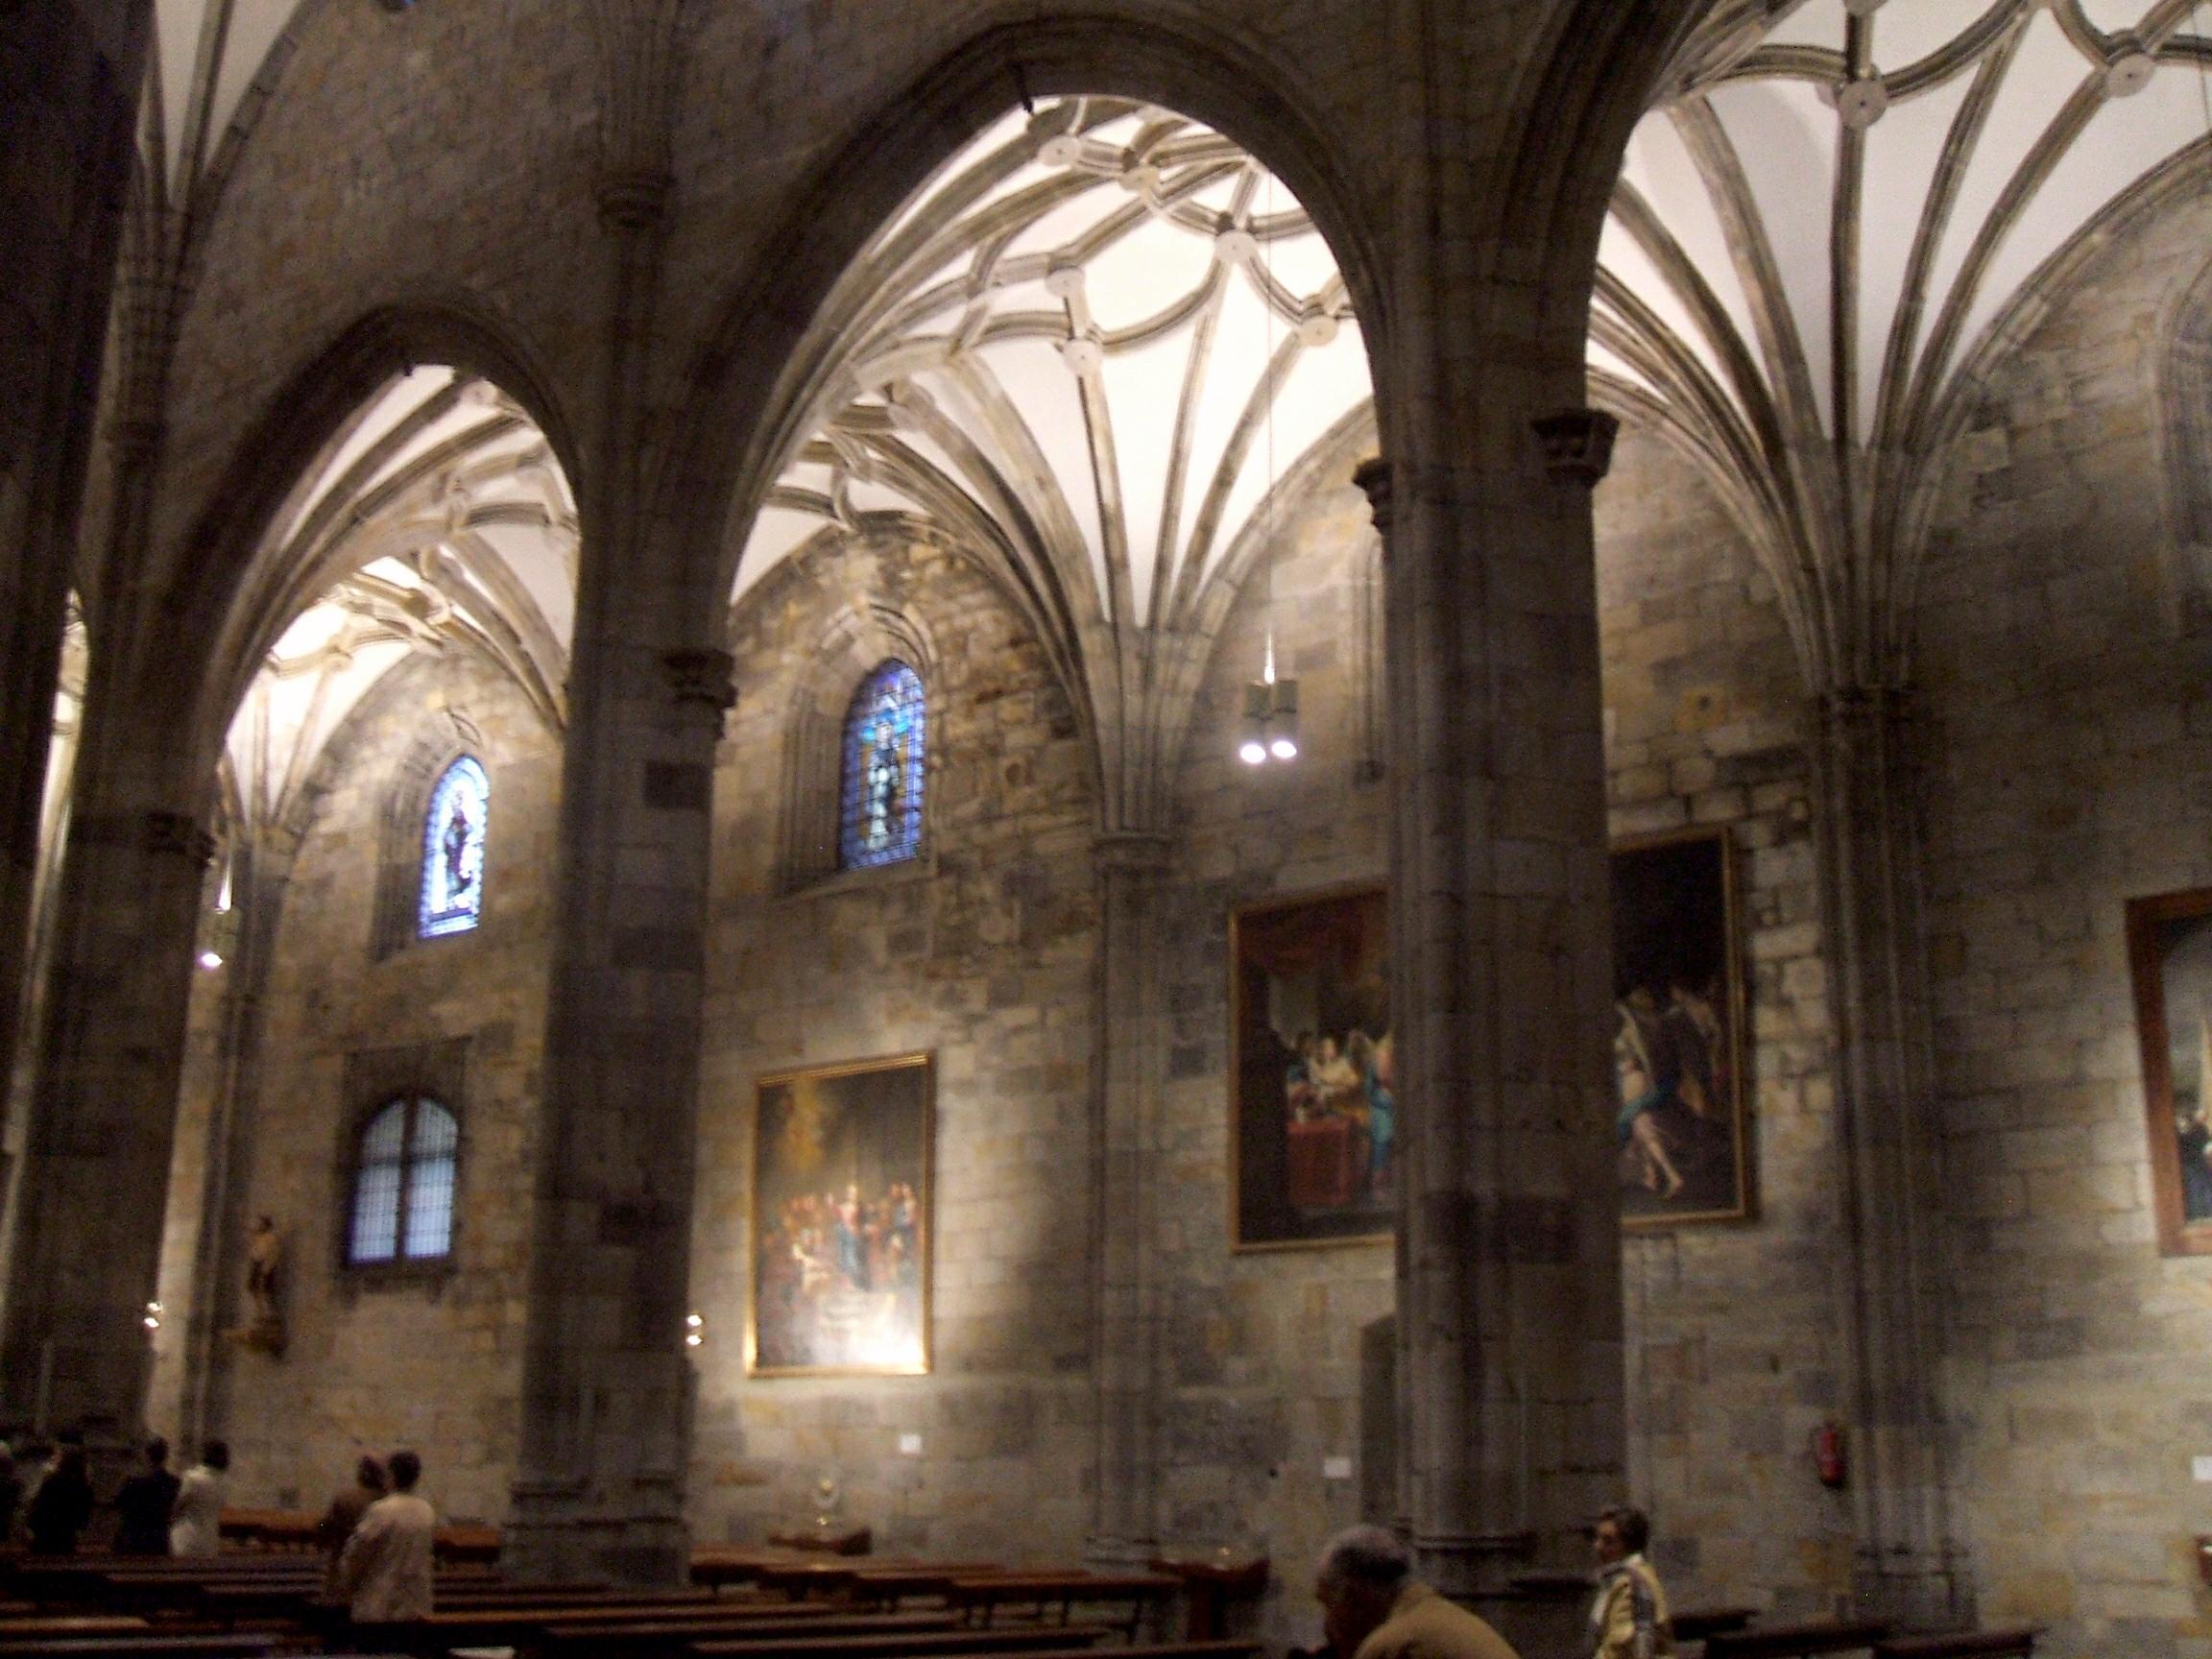 File:Bilbao - Basilica de Begoña 08.JPG - Wikimedia Commons